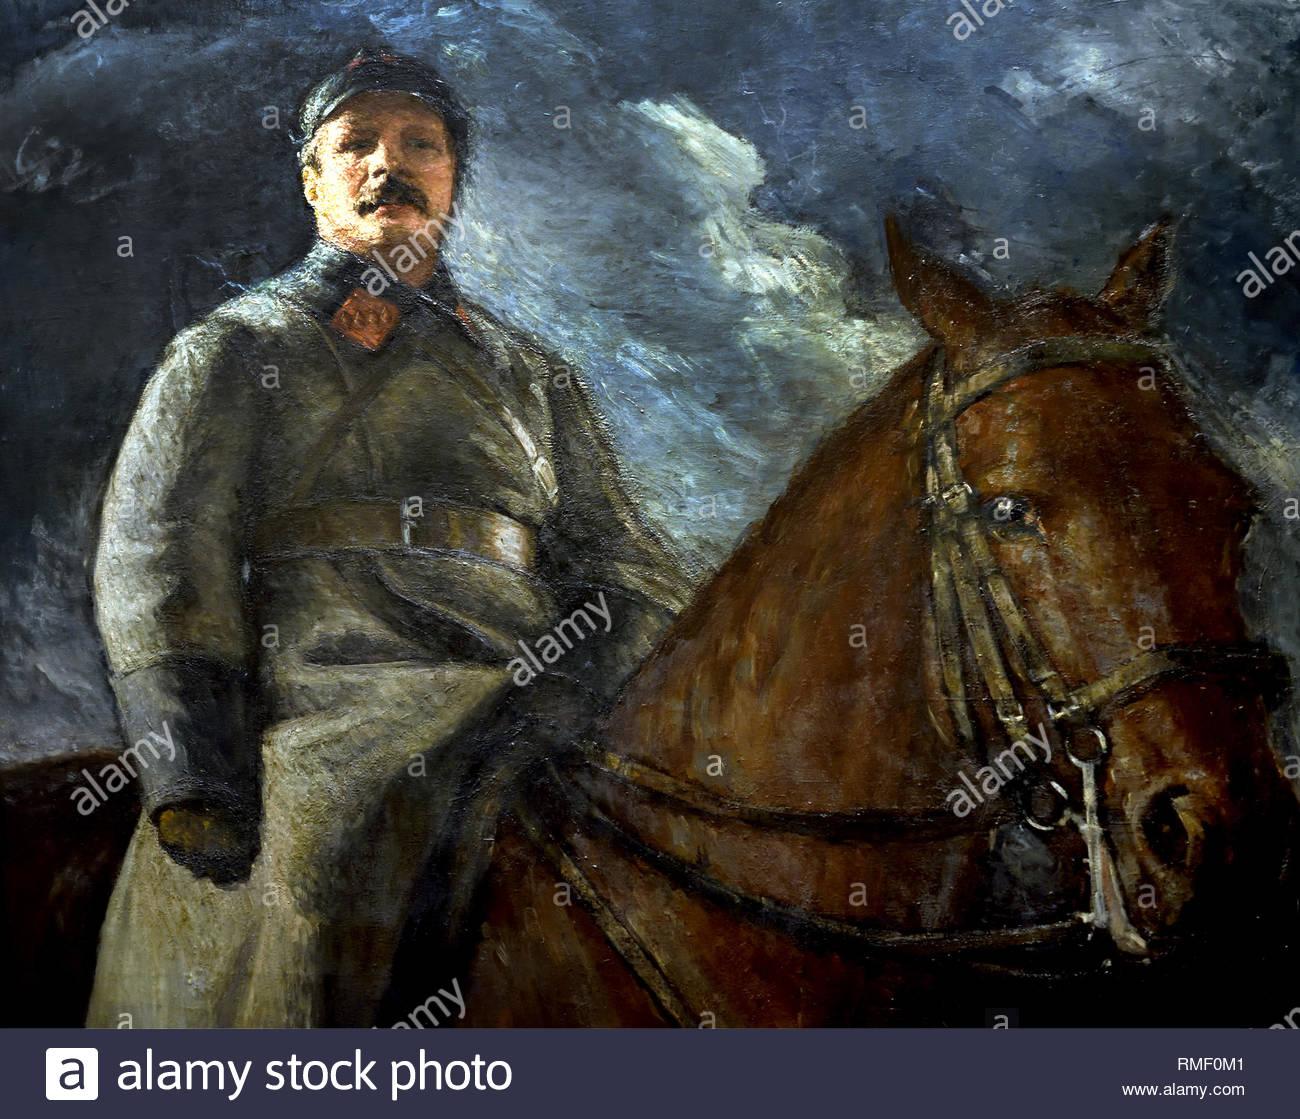 Mikhail Franze on Horseback 1927 by Vladimir Grinberg. Soviet Union Communist Propaganda (Russia under Lenin and Stalin1921-1953 ). - Stock Image